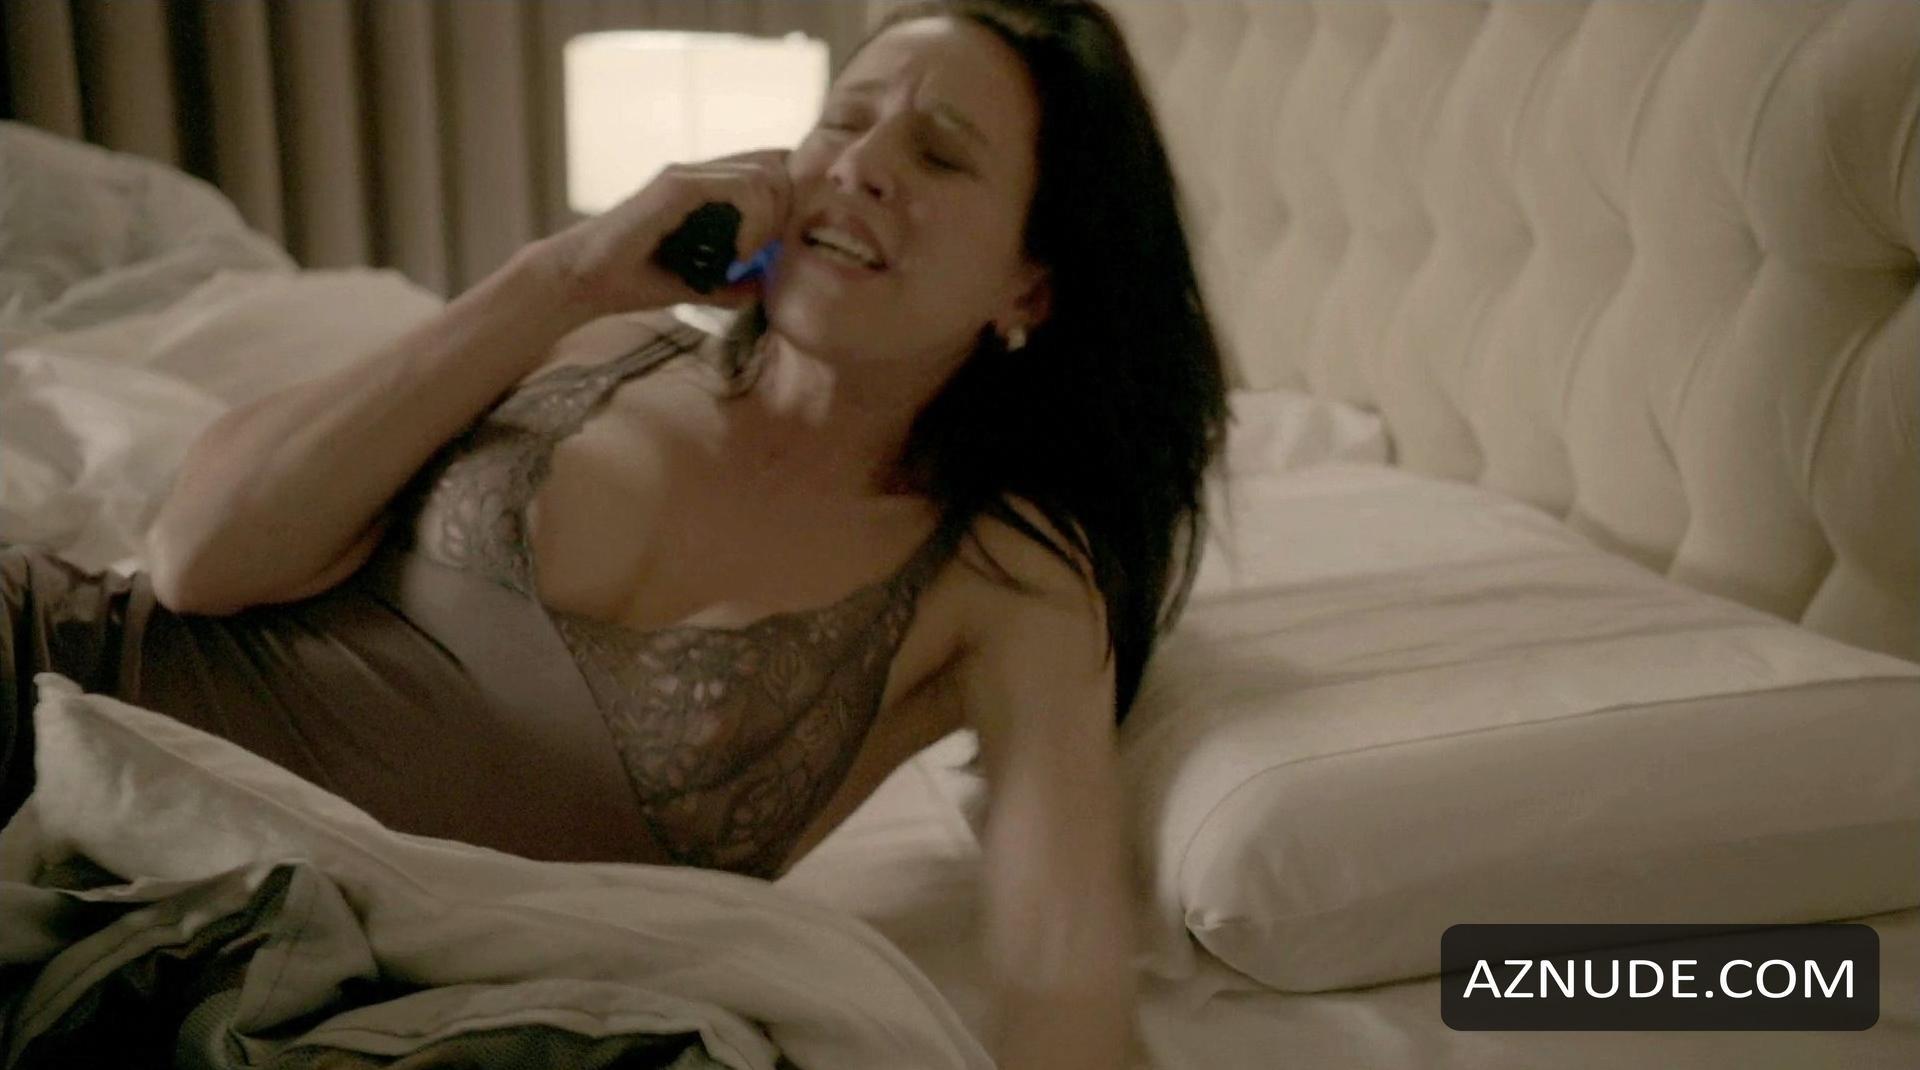 Jennifer lopez nude sex scene on scandalplanetcom - 2 part 3